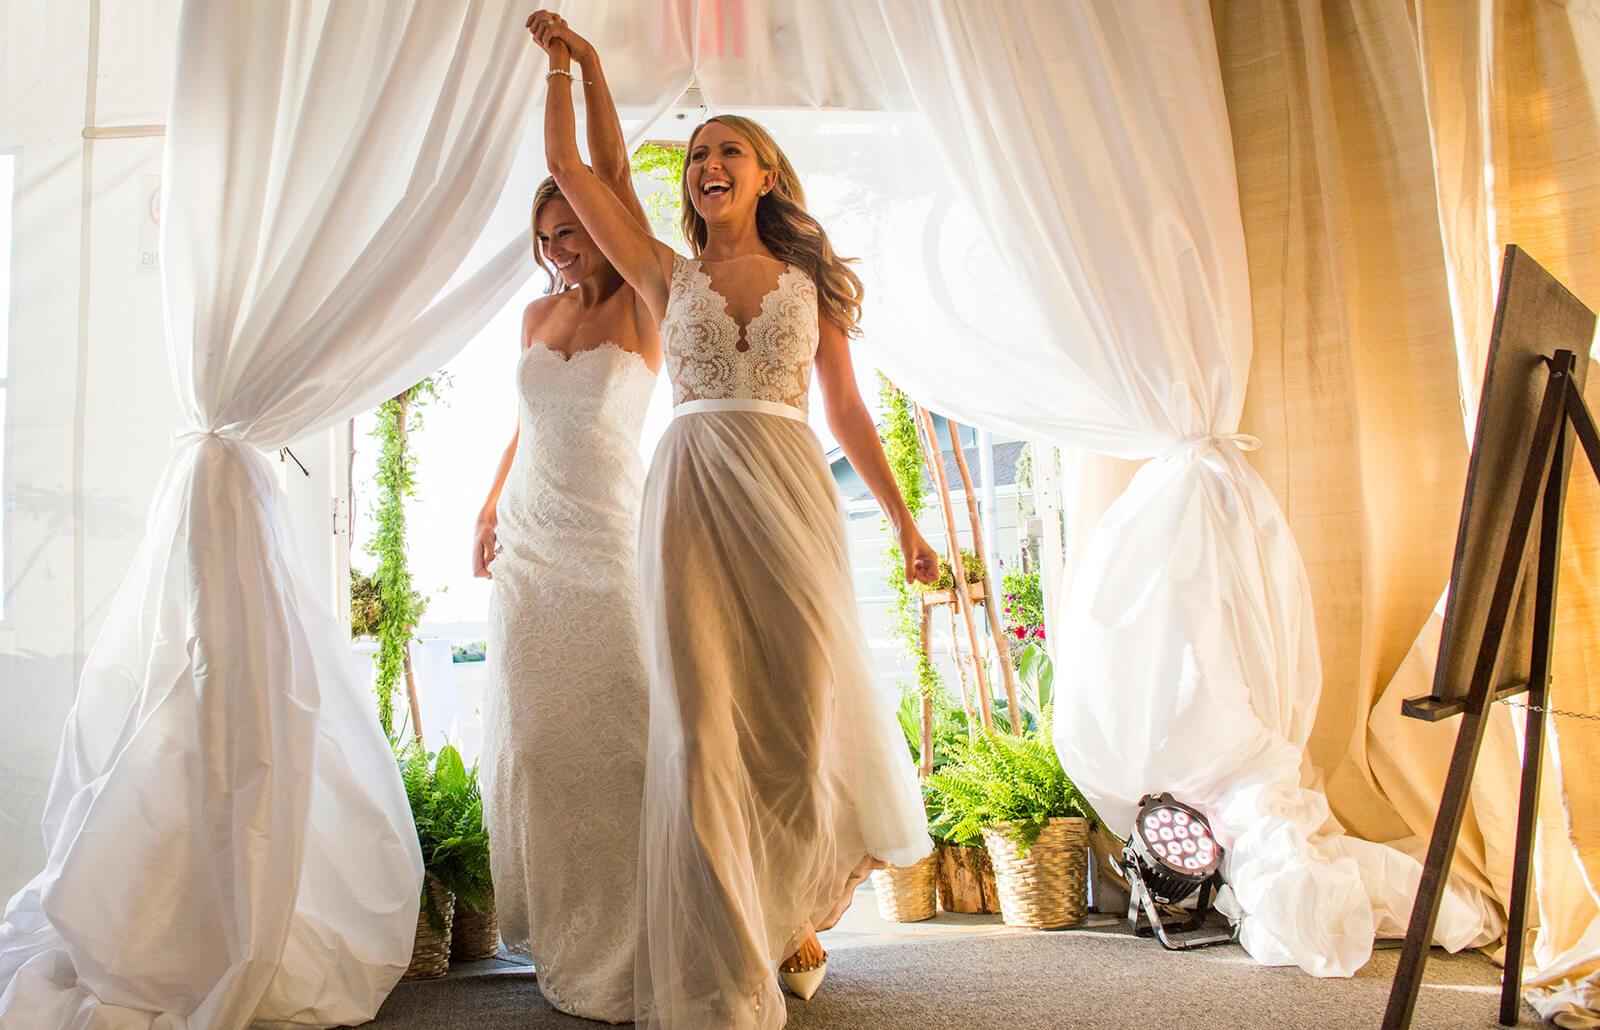 novias-entrando-recepcion-boda.jpg